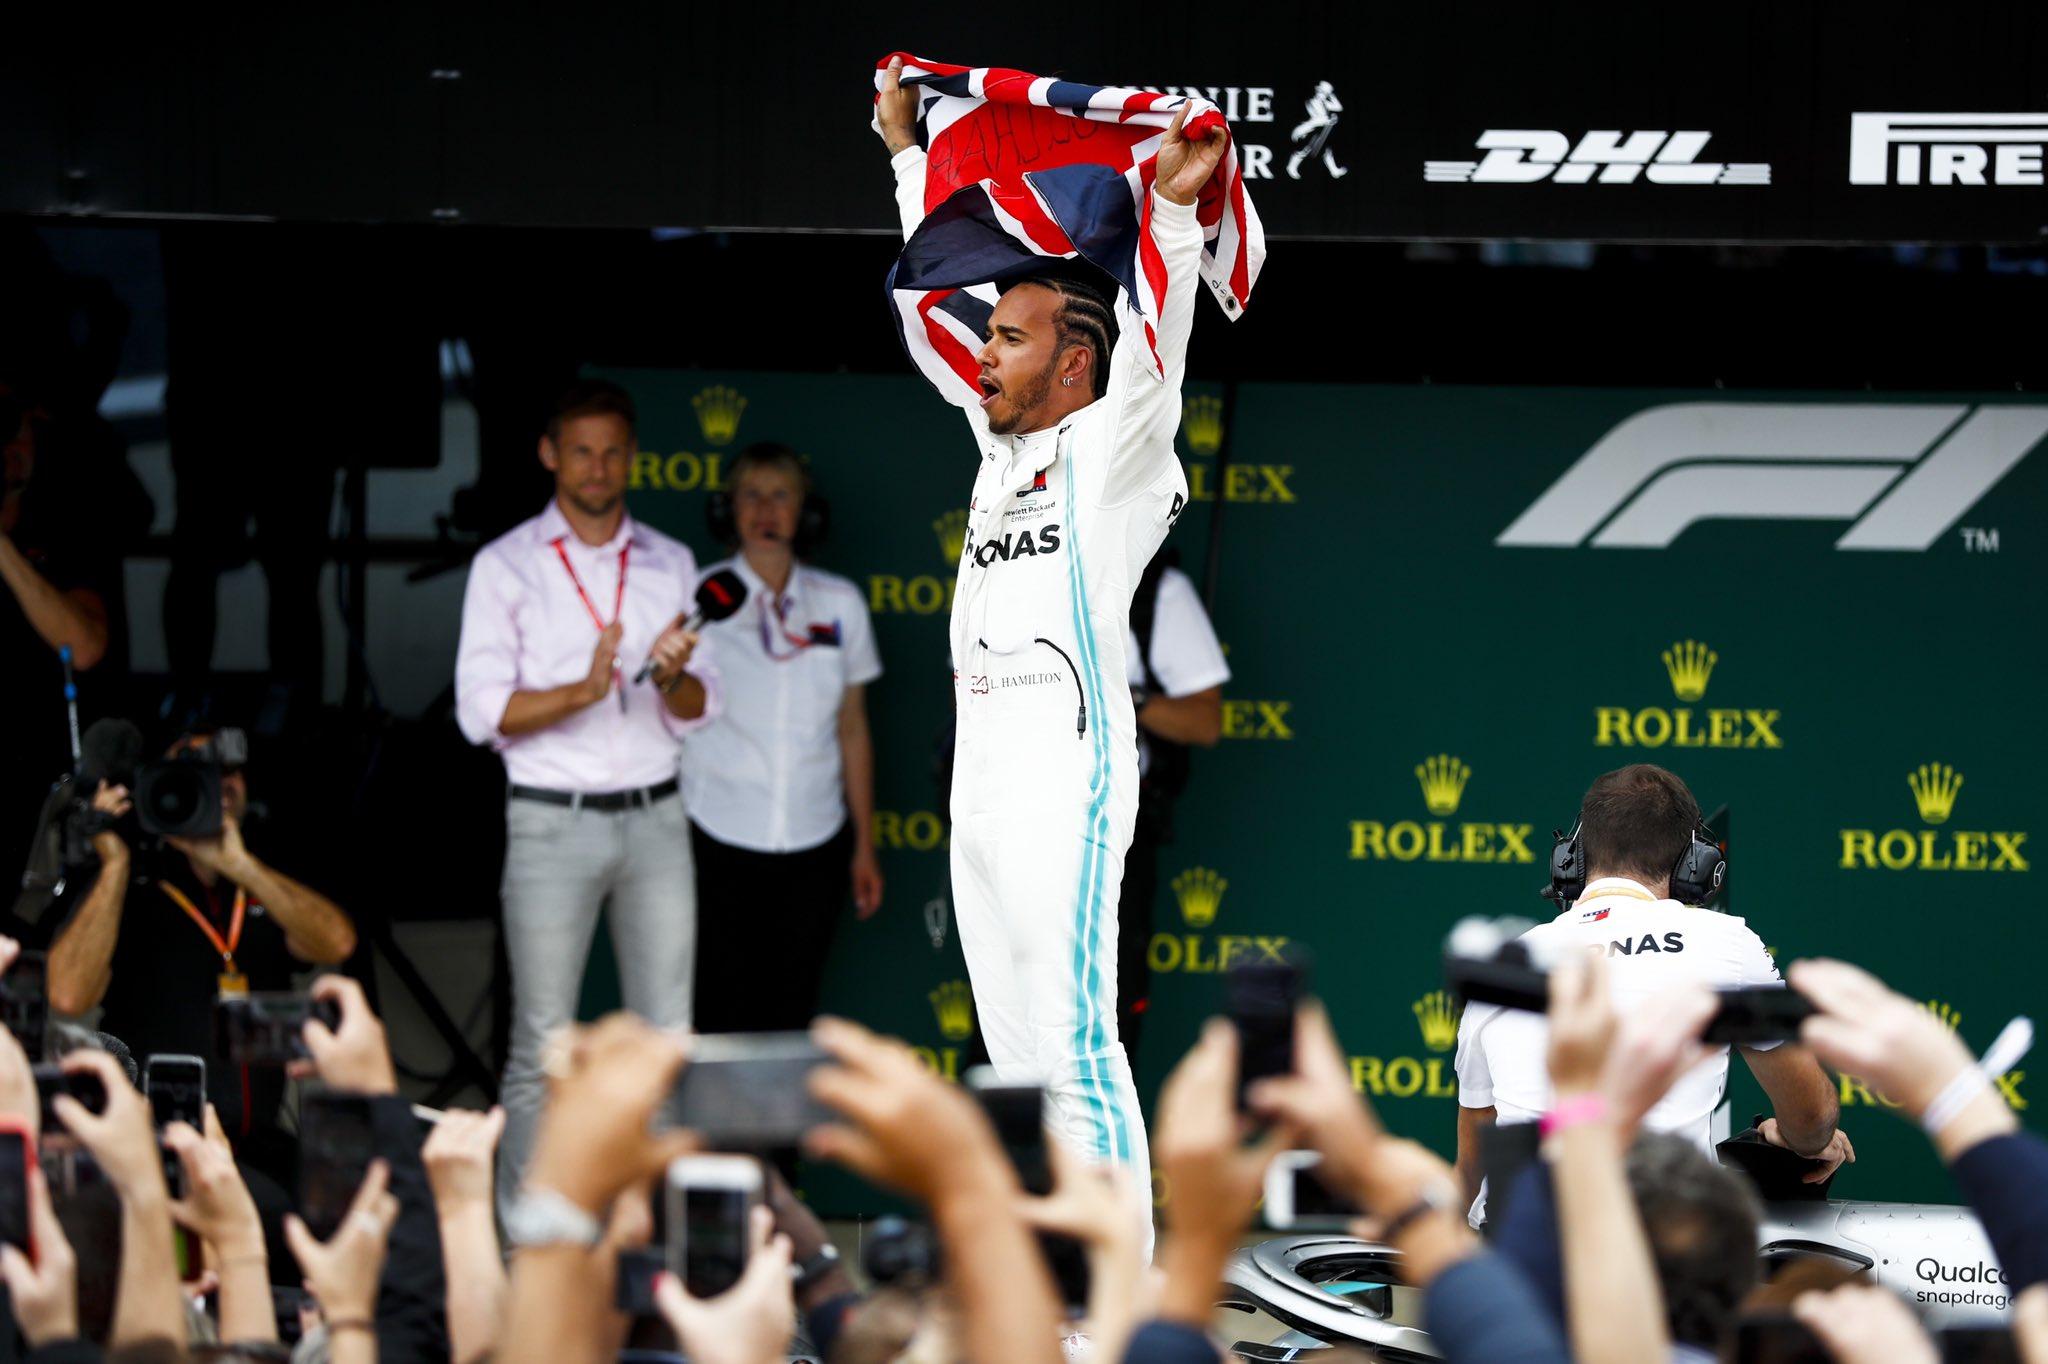 Льюис Хэмилтон - шестикратный чемпион Формулы 1